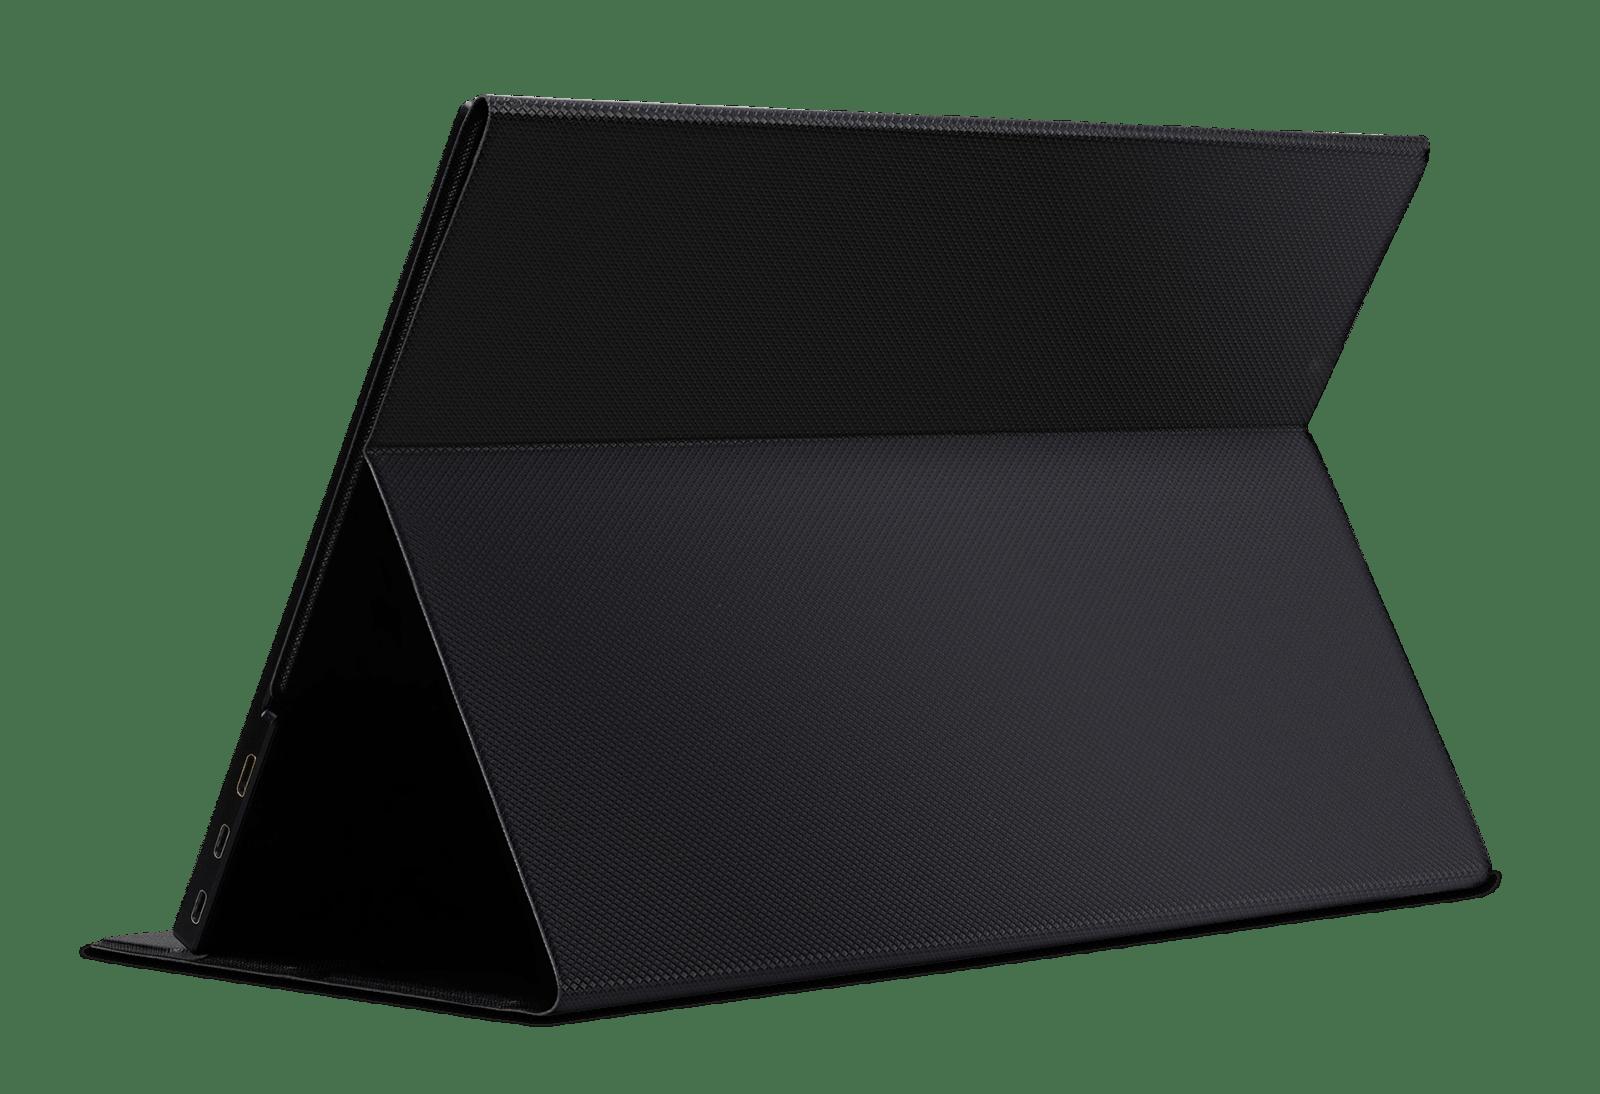 Acer представила новый портативный монитор AOPEN 16PM3Q (aopen pm3 series 16pm3q 05)